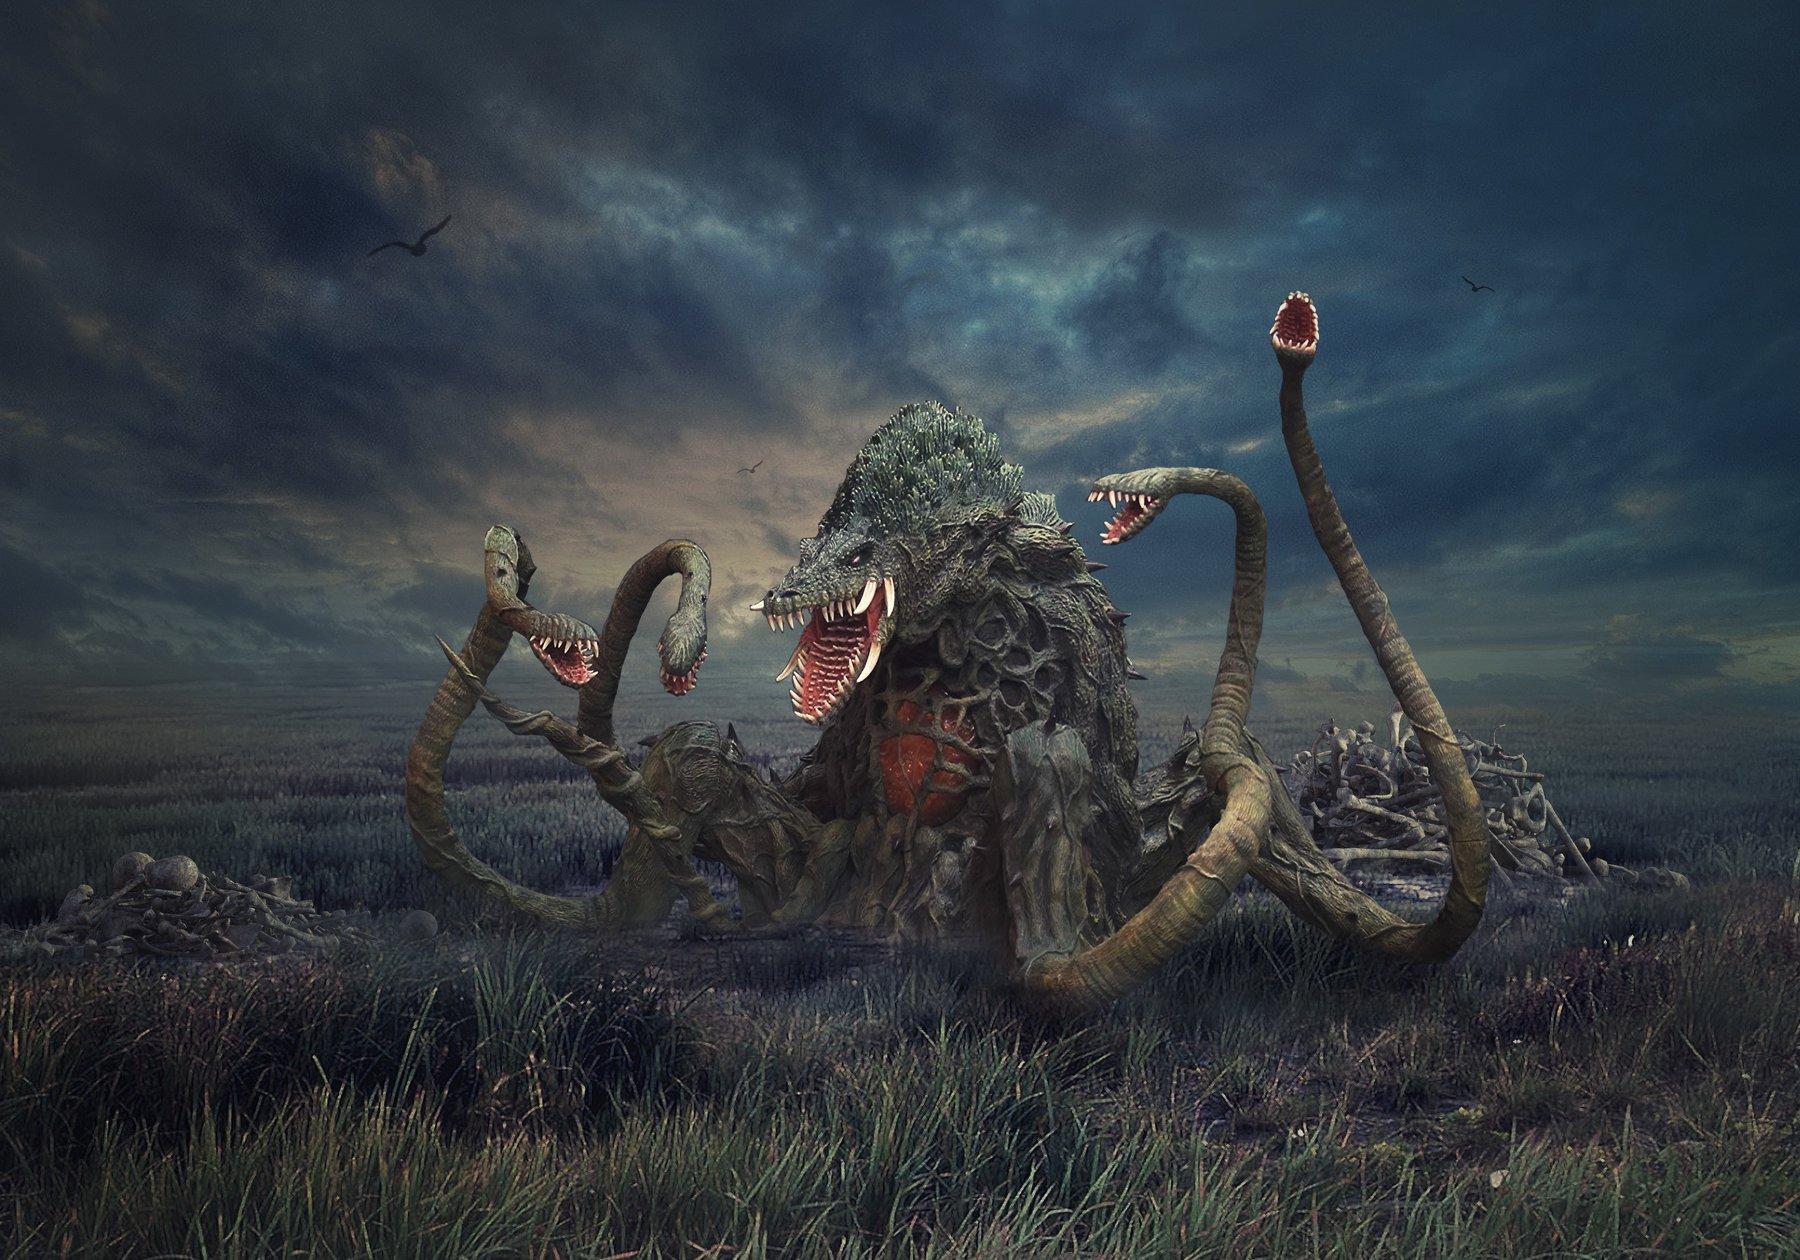 монстр, болото, облака, Sergii Vidov